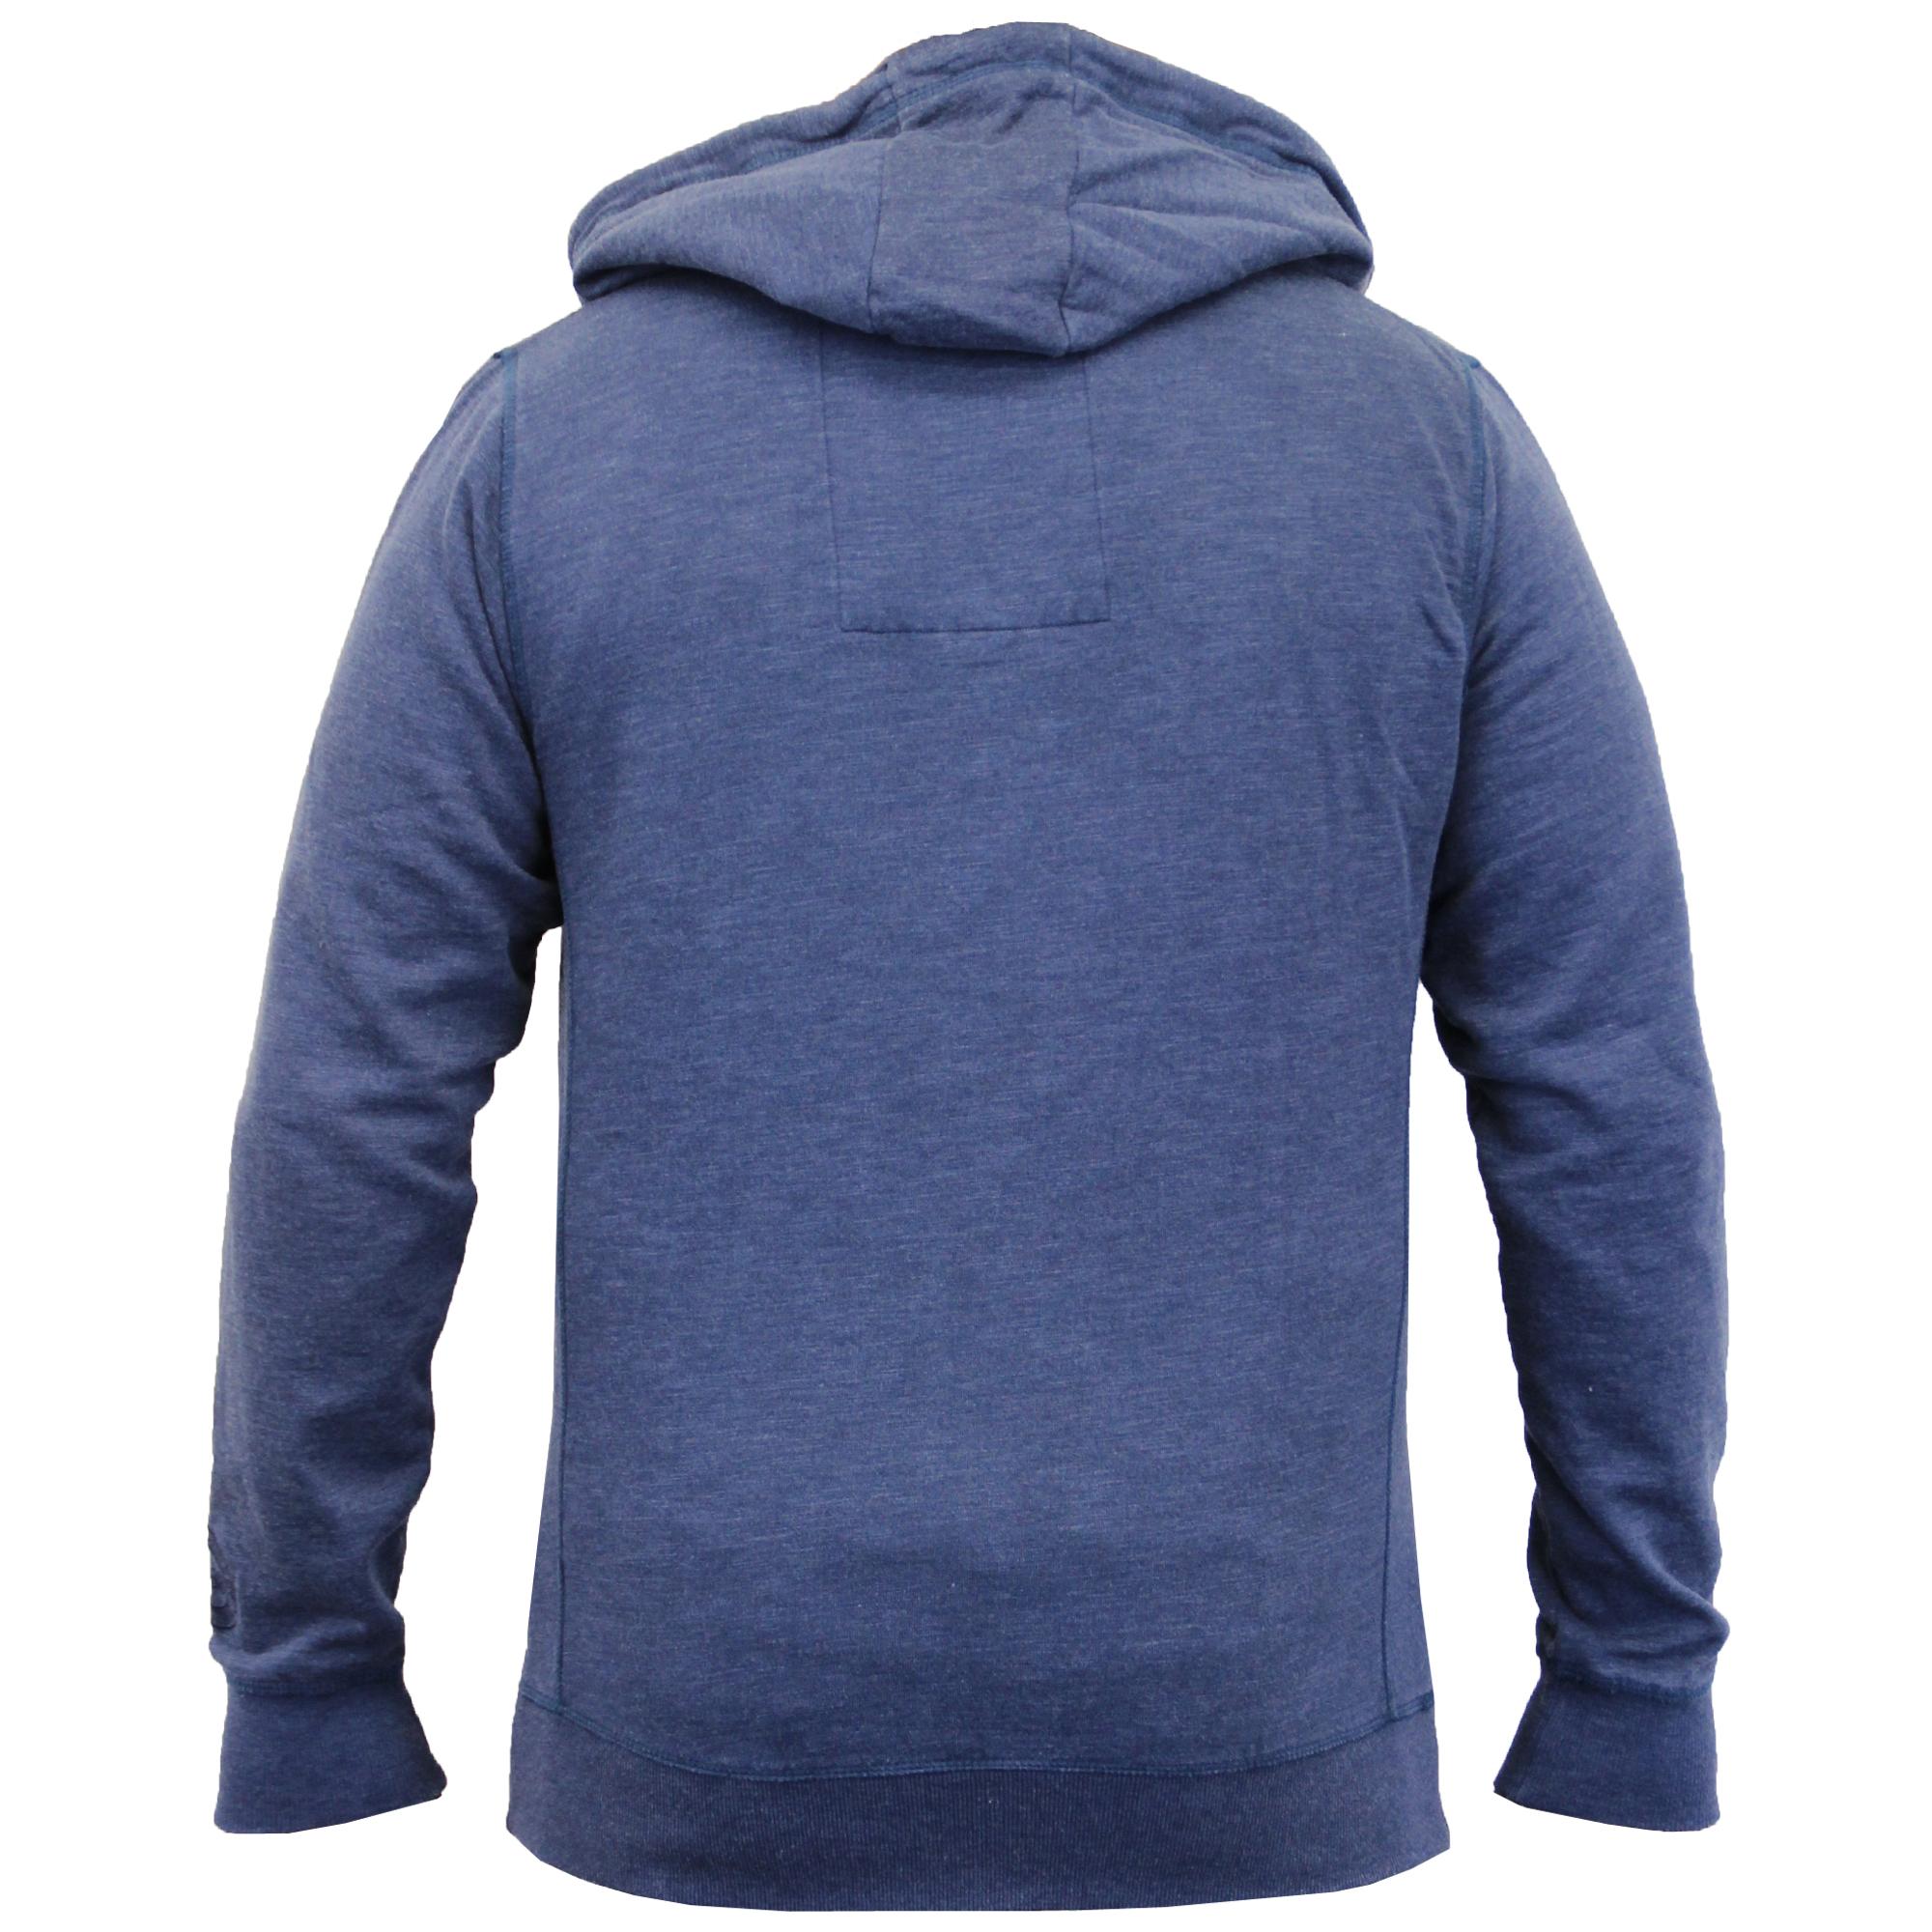 Mens-Sweatshirt-Tokyo-Laundry-Hooded-Top-Sweat-Applique-Zip-Gym-Fleece-Lined-New thumbnail 5